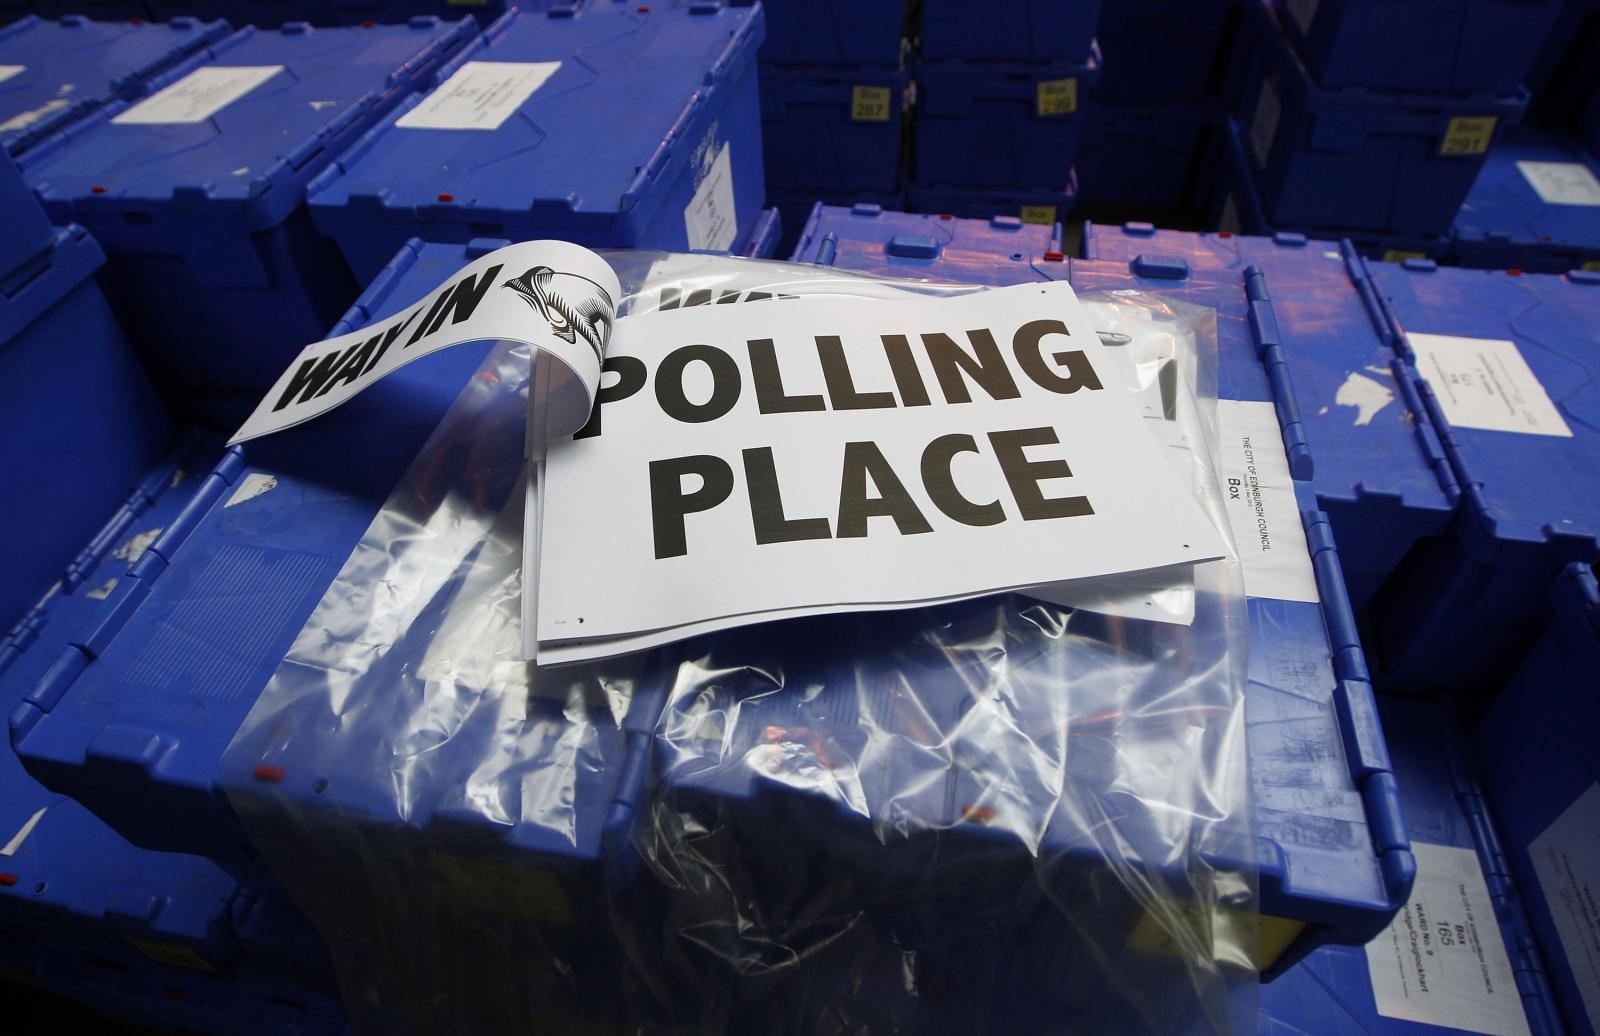 Polling box